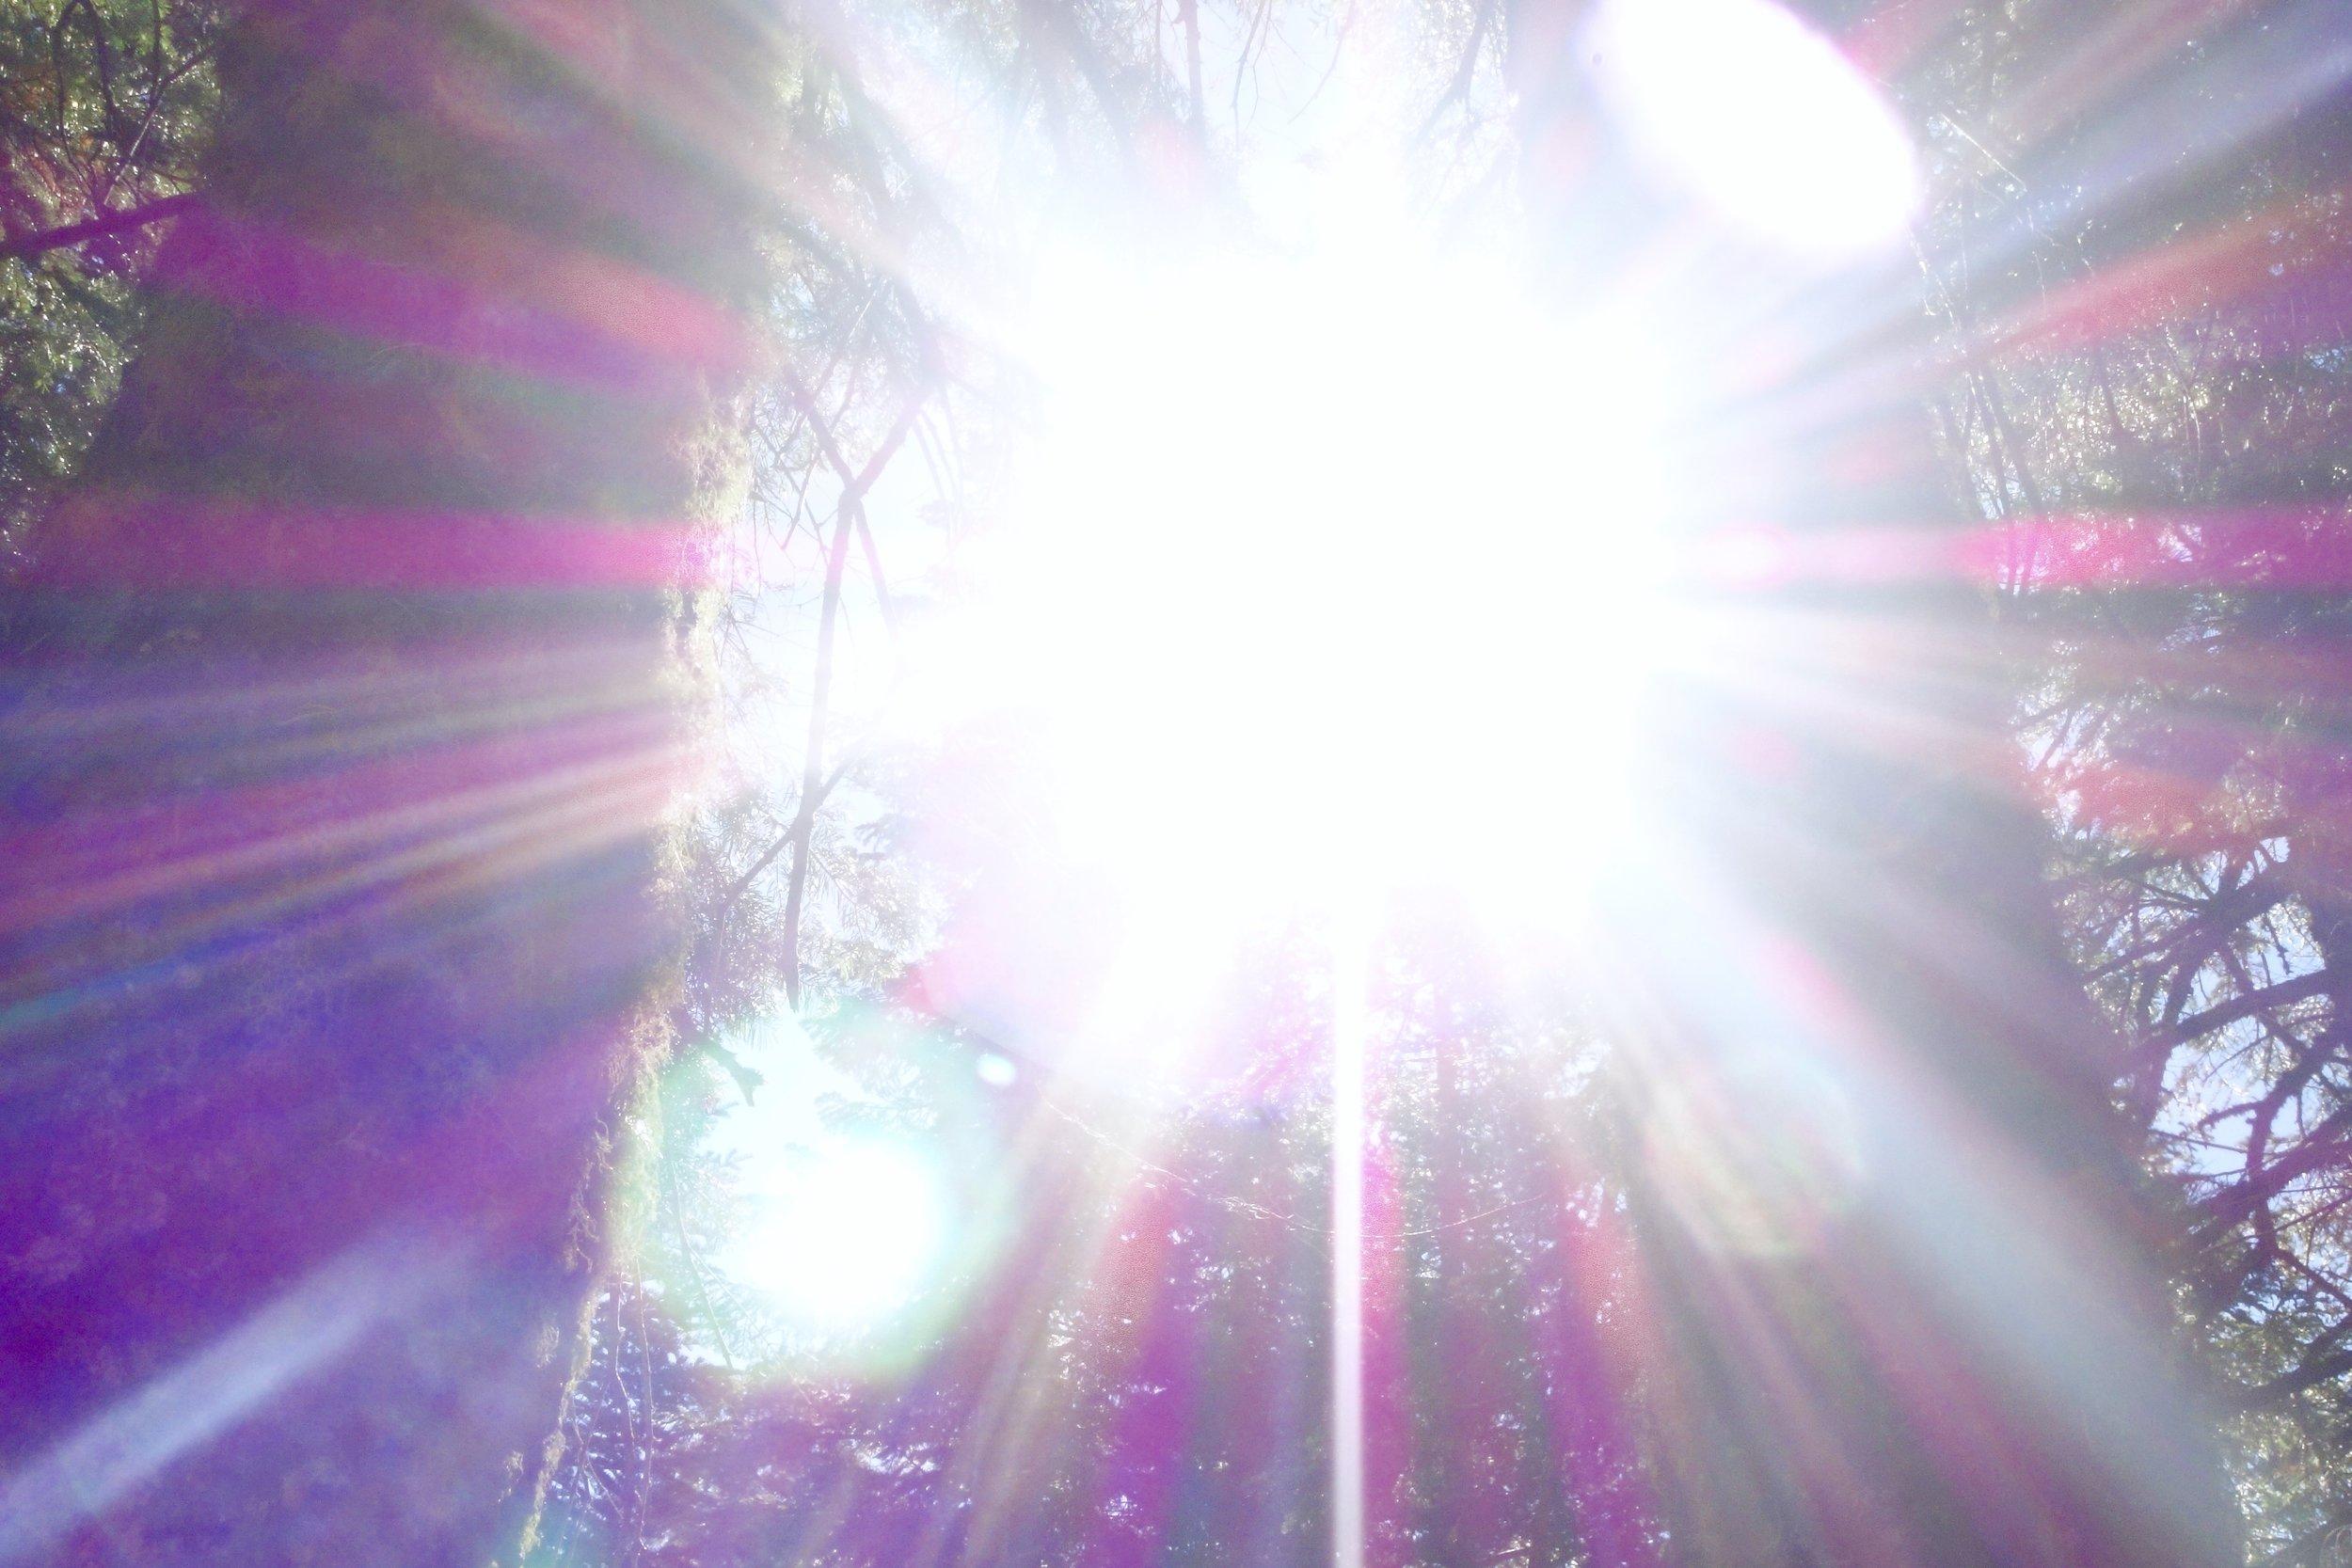 Mt Shasta Spiritual Tours